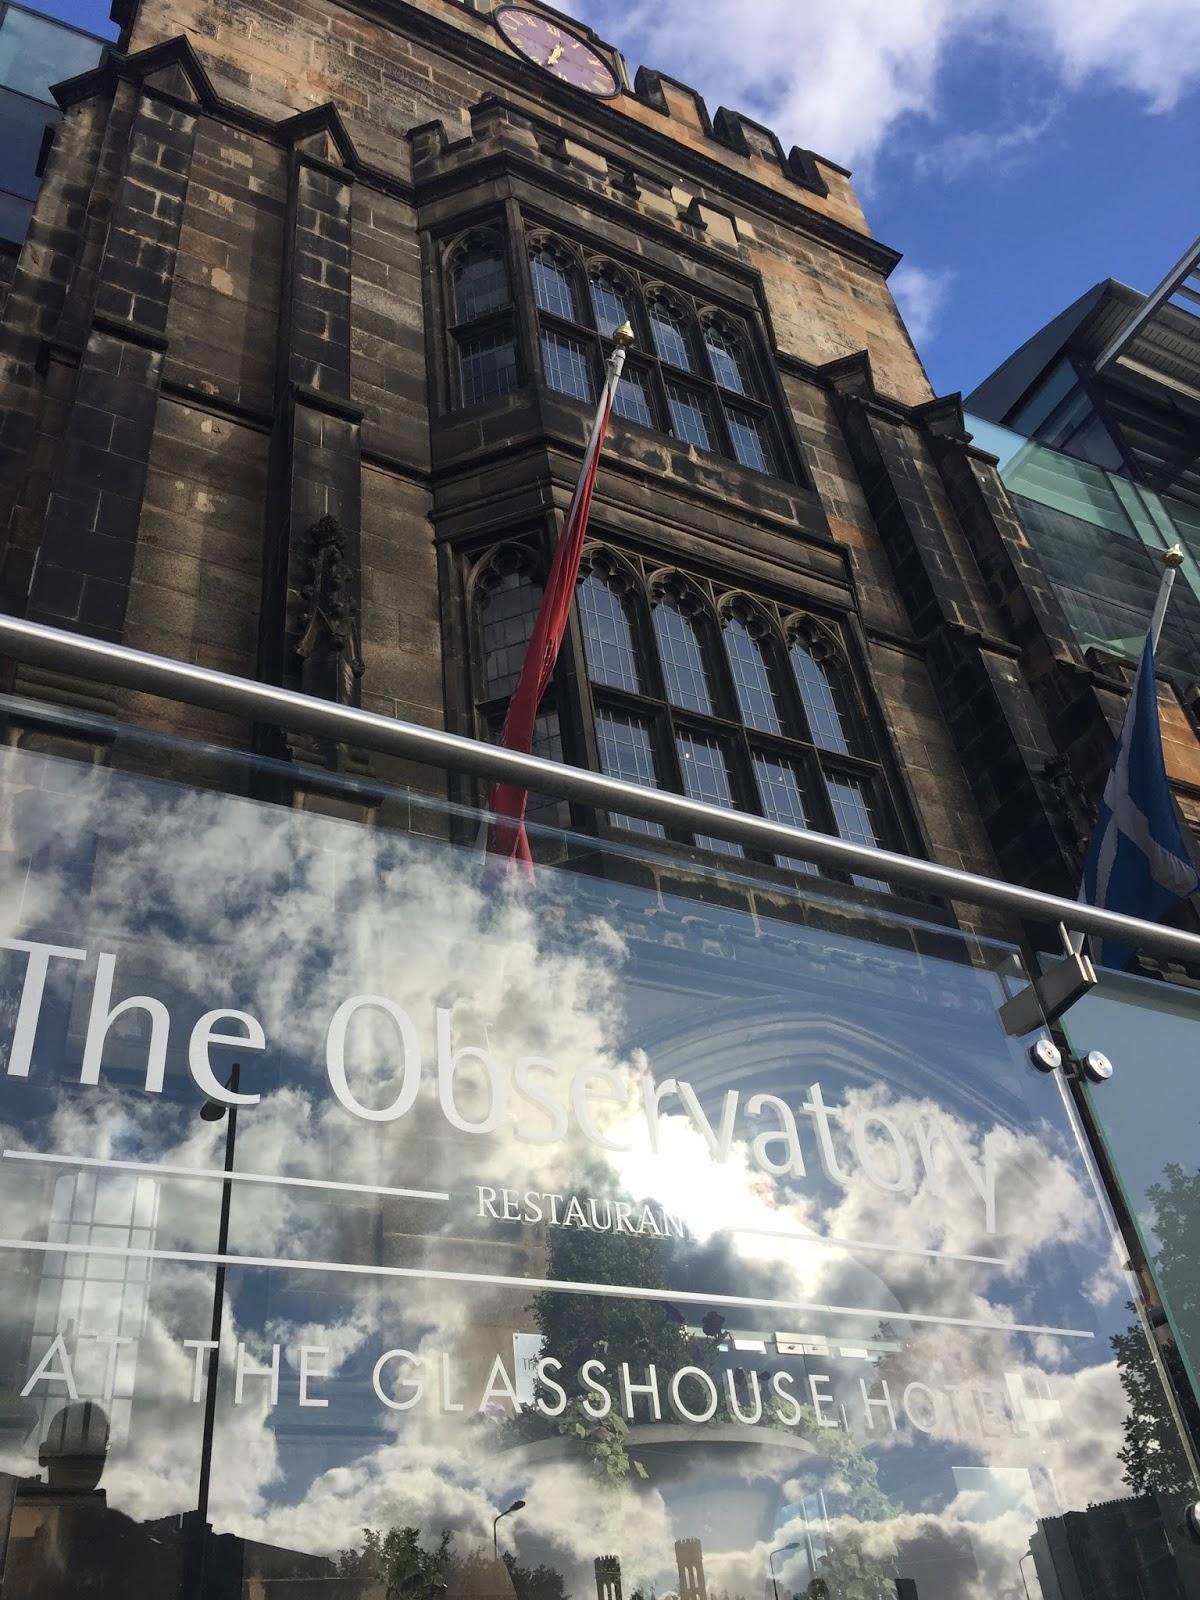 The Observatory Restaurant at The Glasshouse Hotel Edinburgh